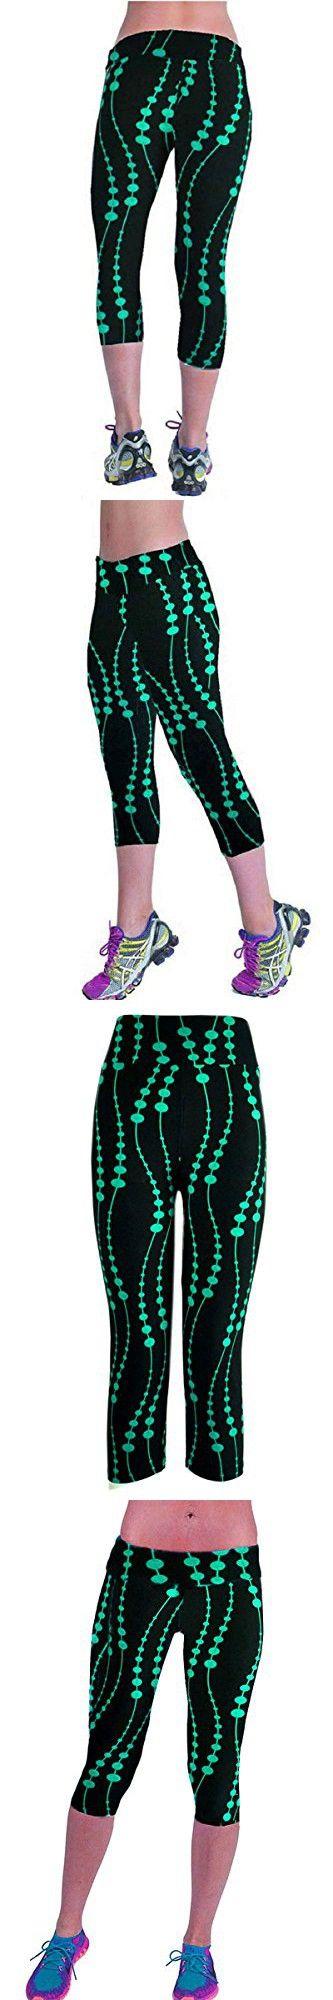 Ancia Womens Yoga Active Fitness Capri Leggings Gym Tights(Green Black,M)